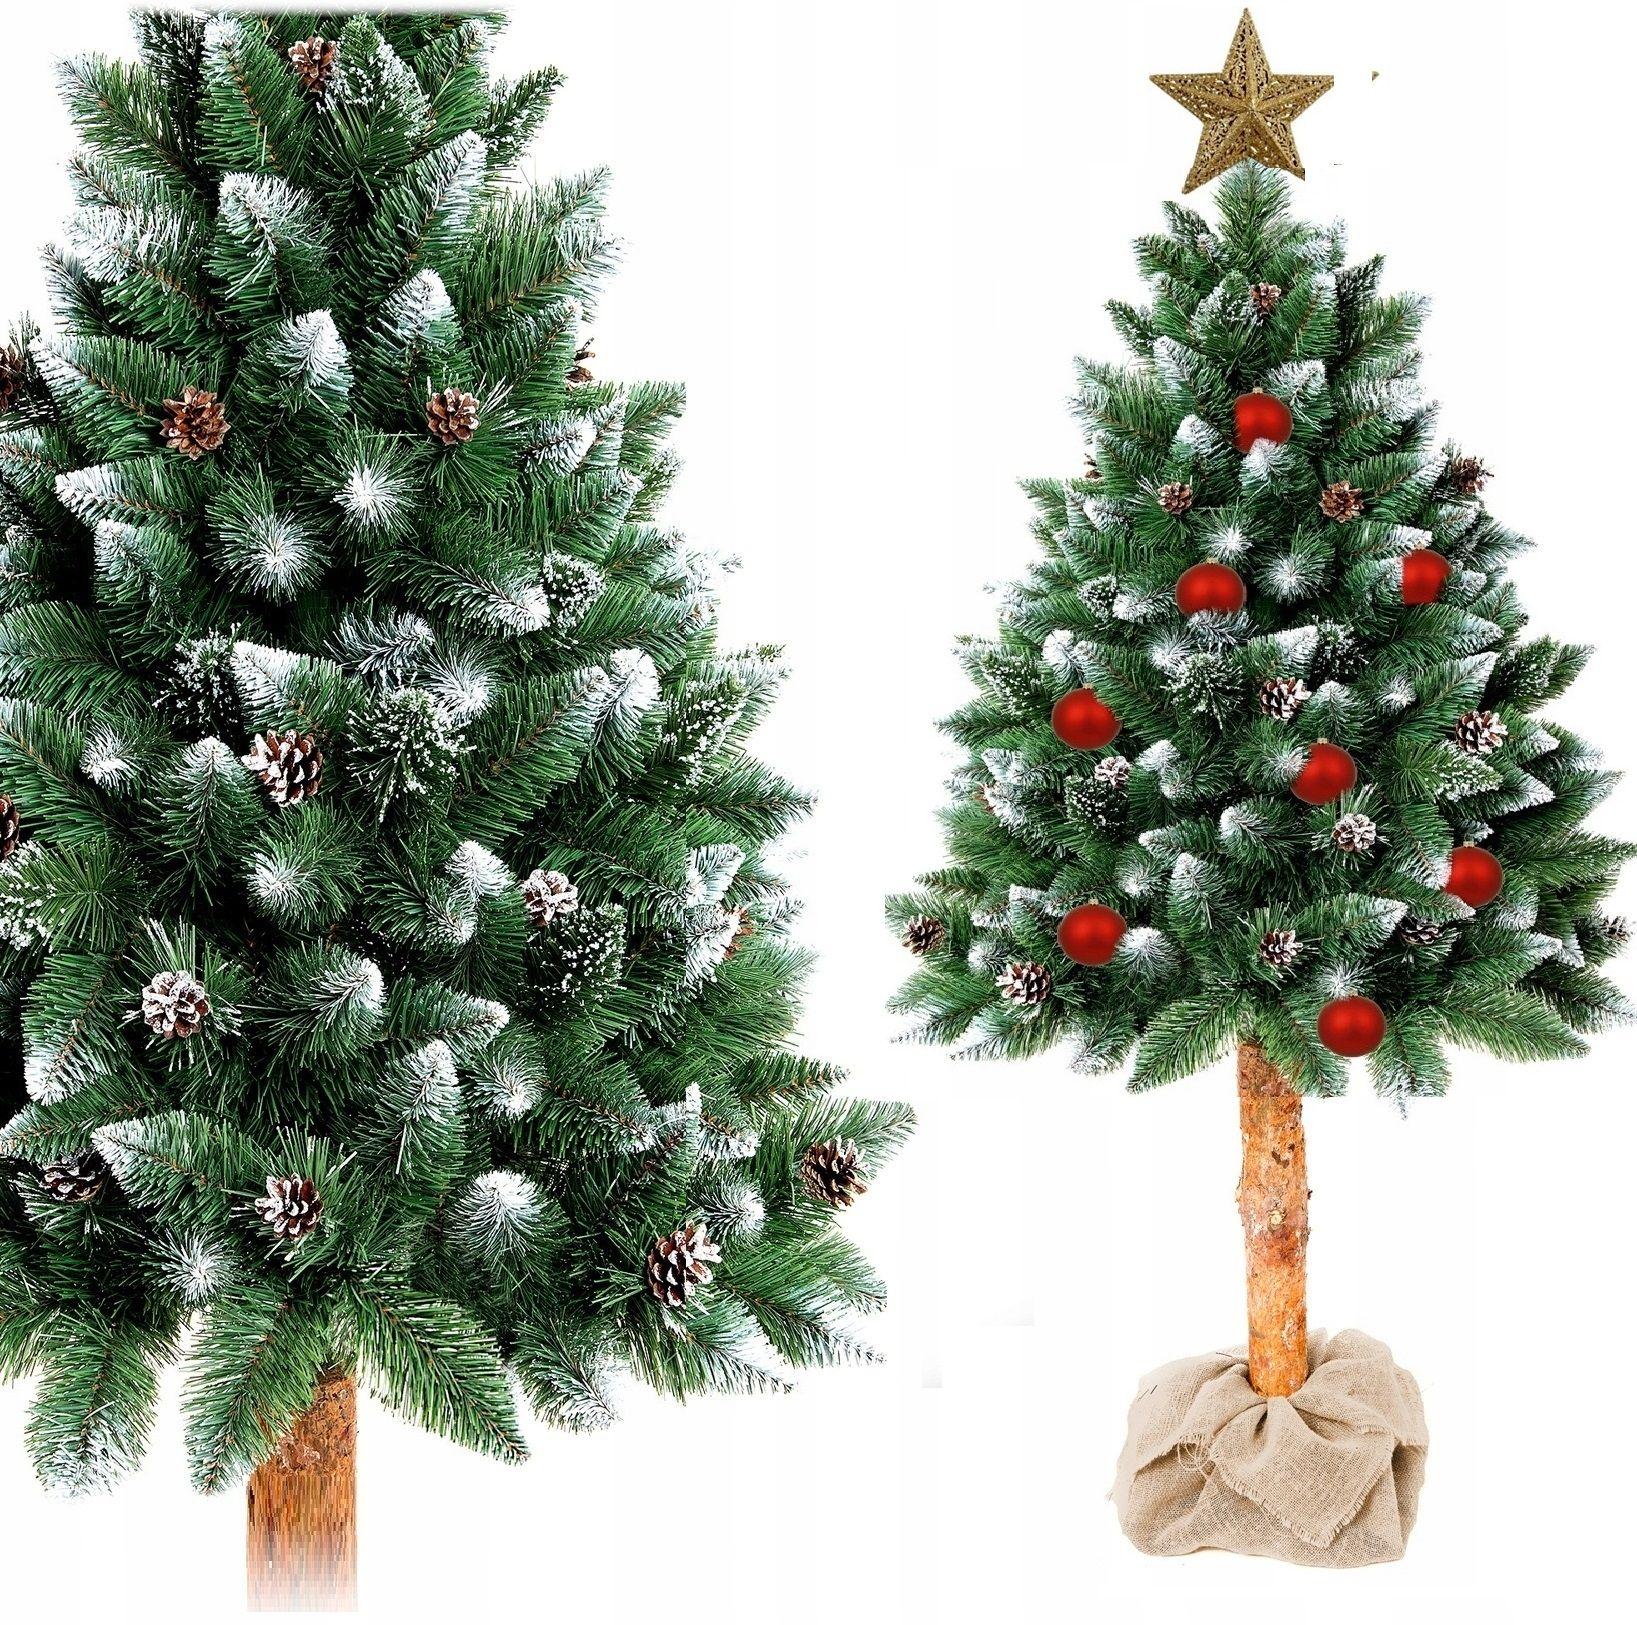 Choinka Sztuczna Na Pniu Sosna Diamentowa 180 Cm 7535742600 Oficjalne Archiwum Allegro Holiday Decor Christmas Tree Christmas